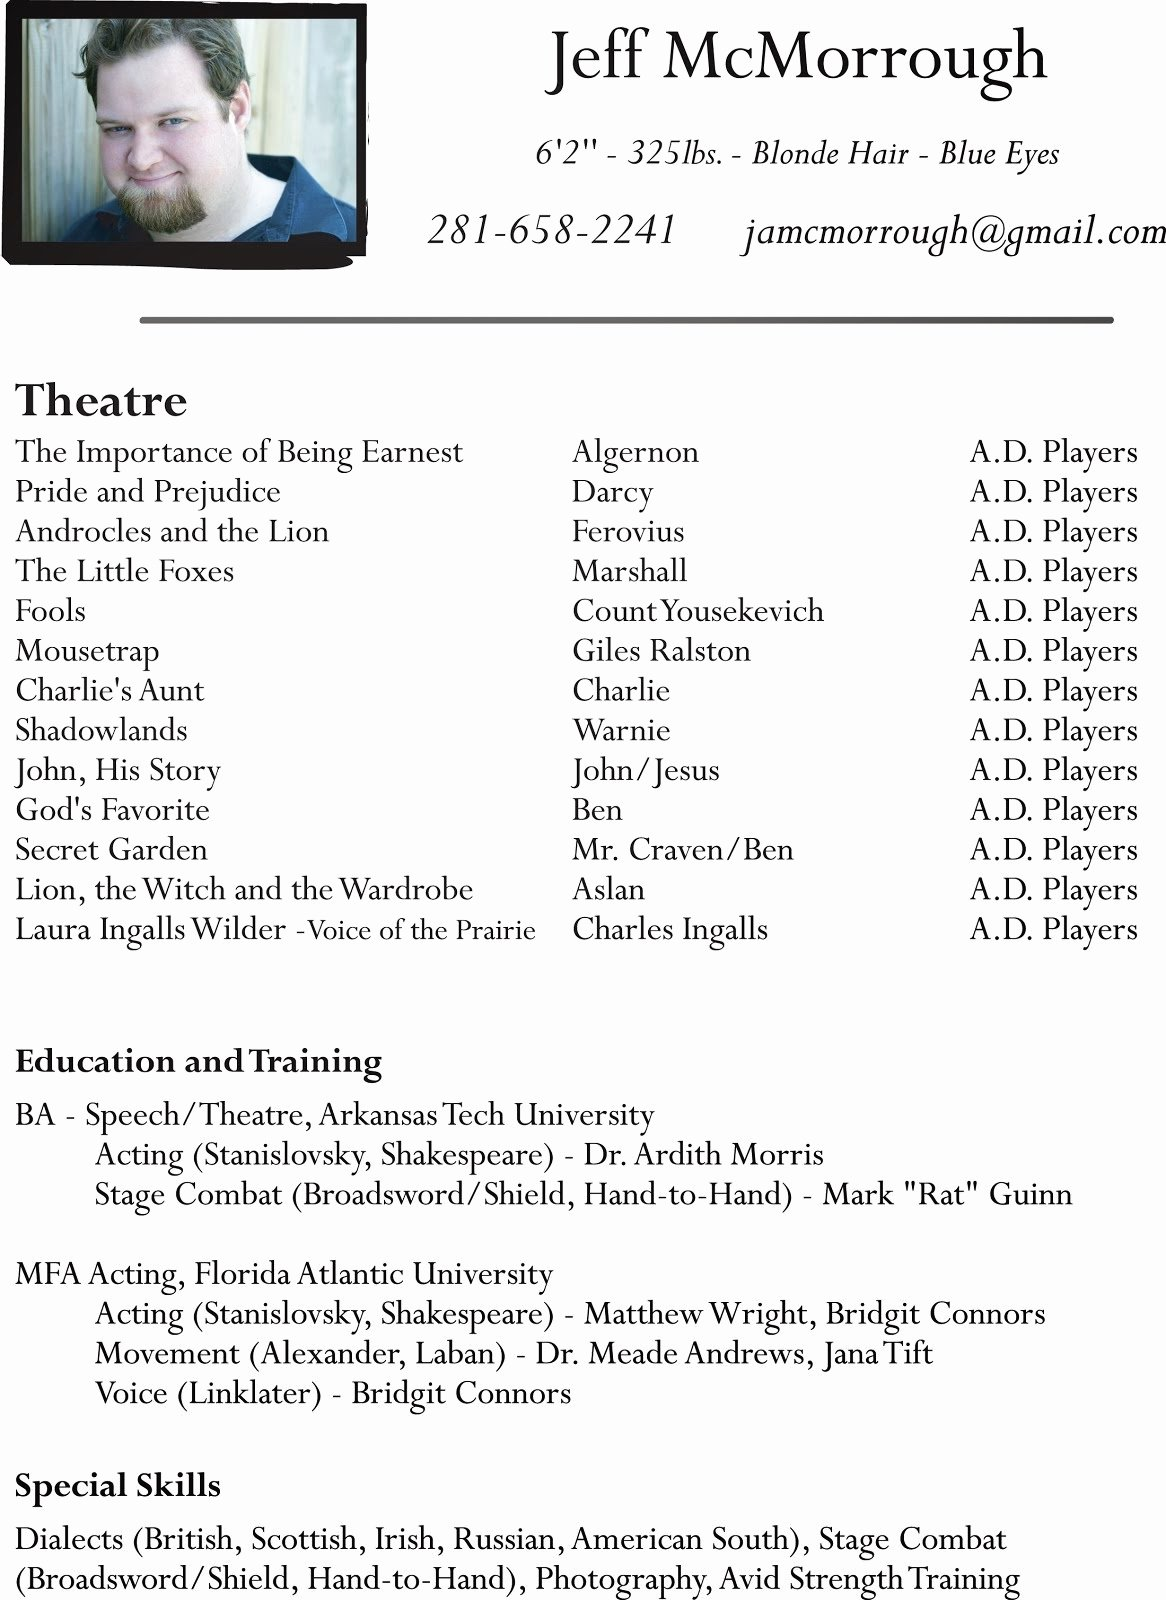 Beginner Acting Resume Template Fresh Talent Star Acting Resume Actor Beginner Kids theatre